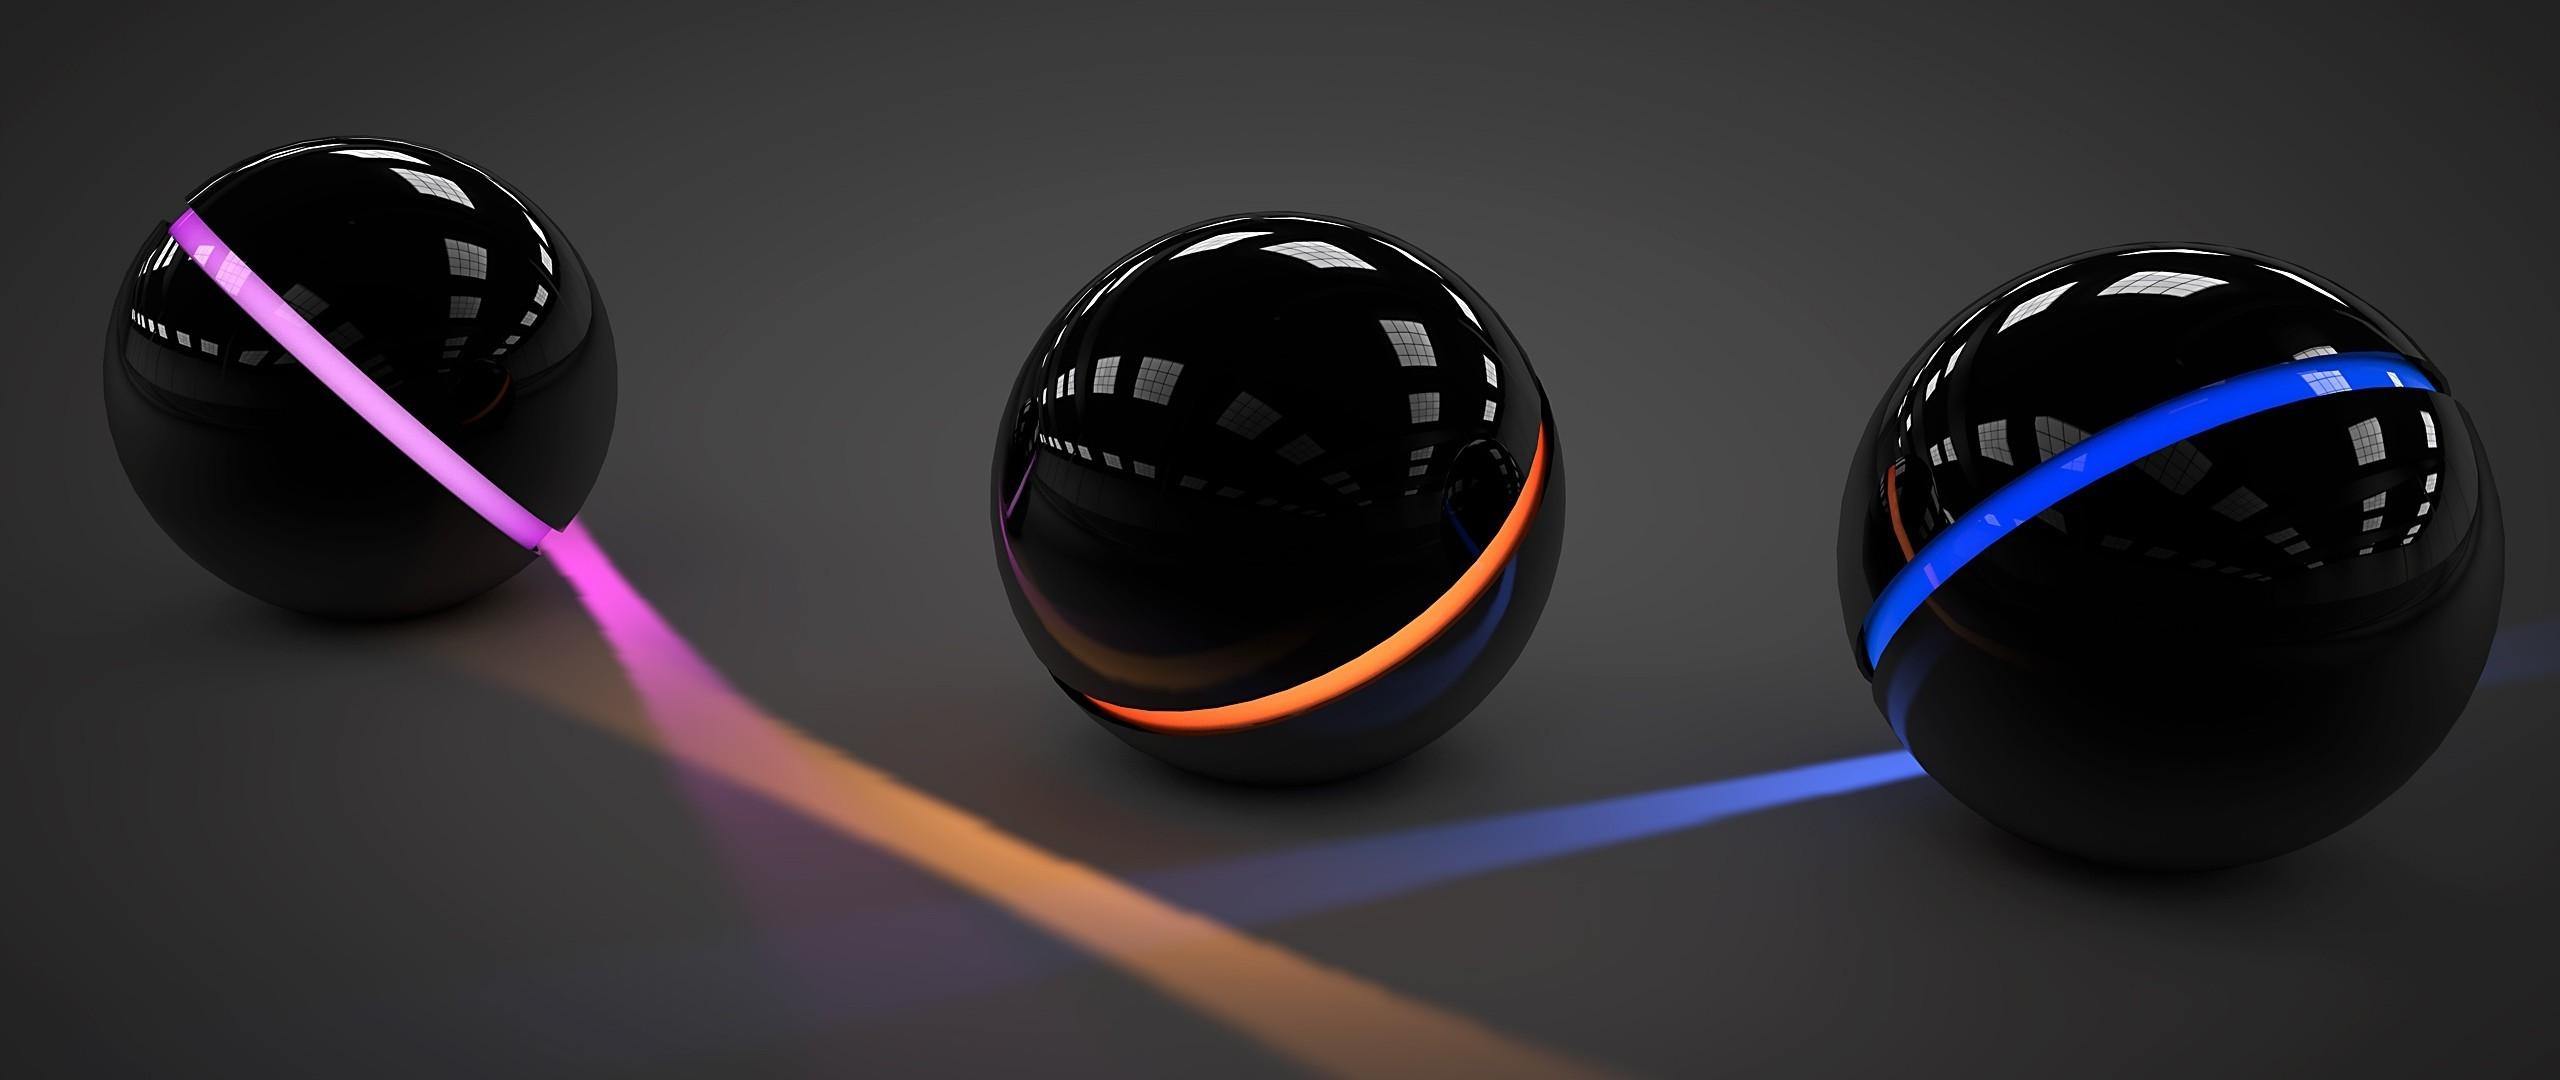 Wallpaper : Black, Abstract, 3D, Sphere, Circle, Ball